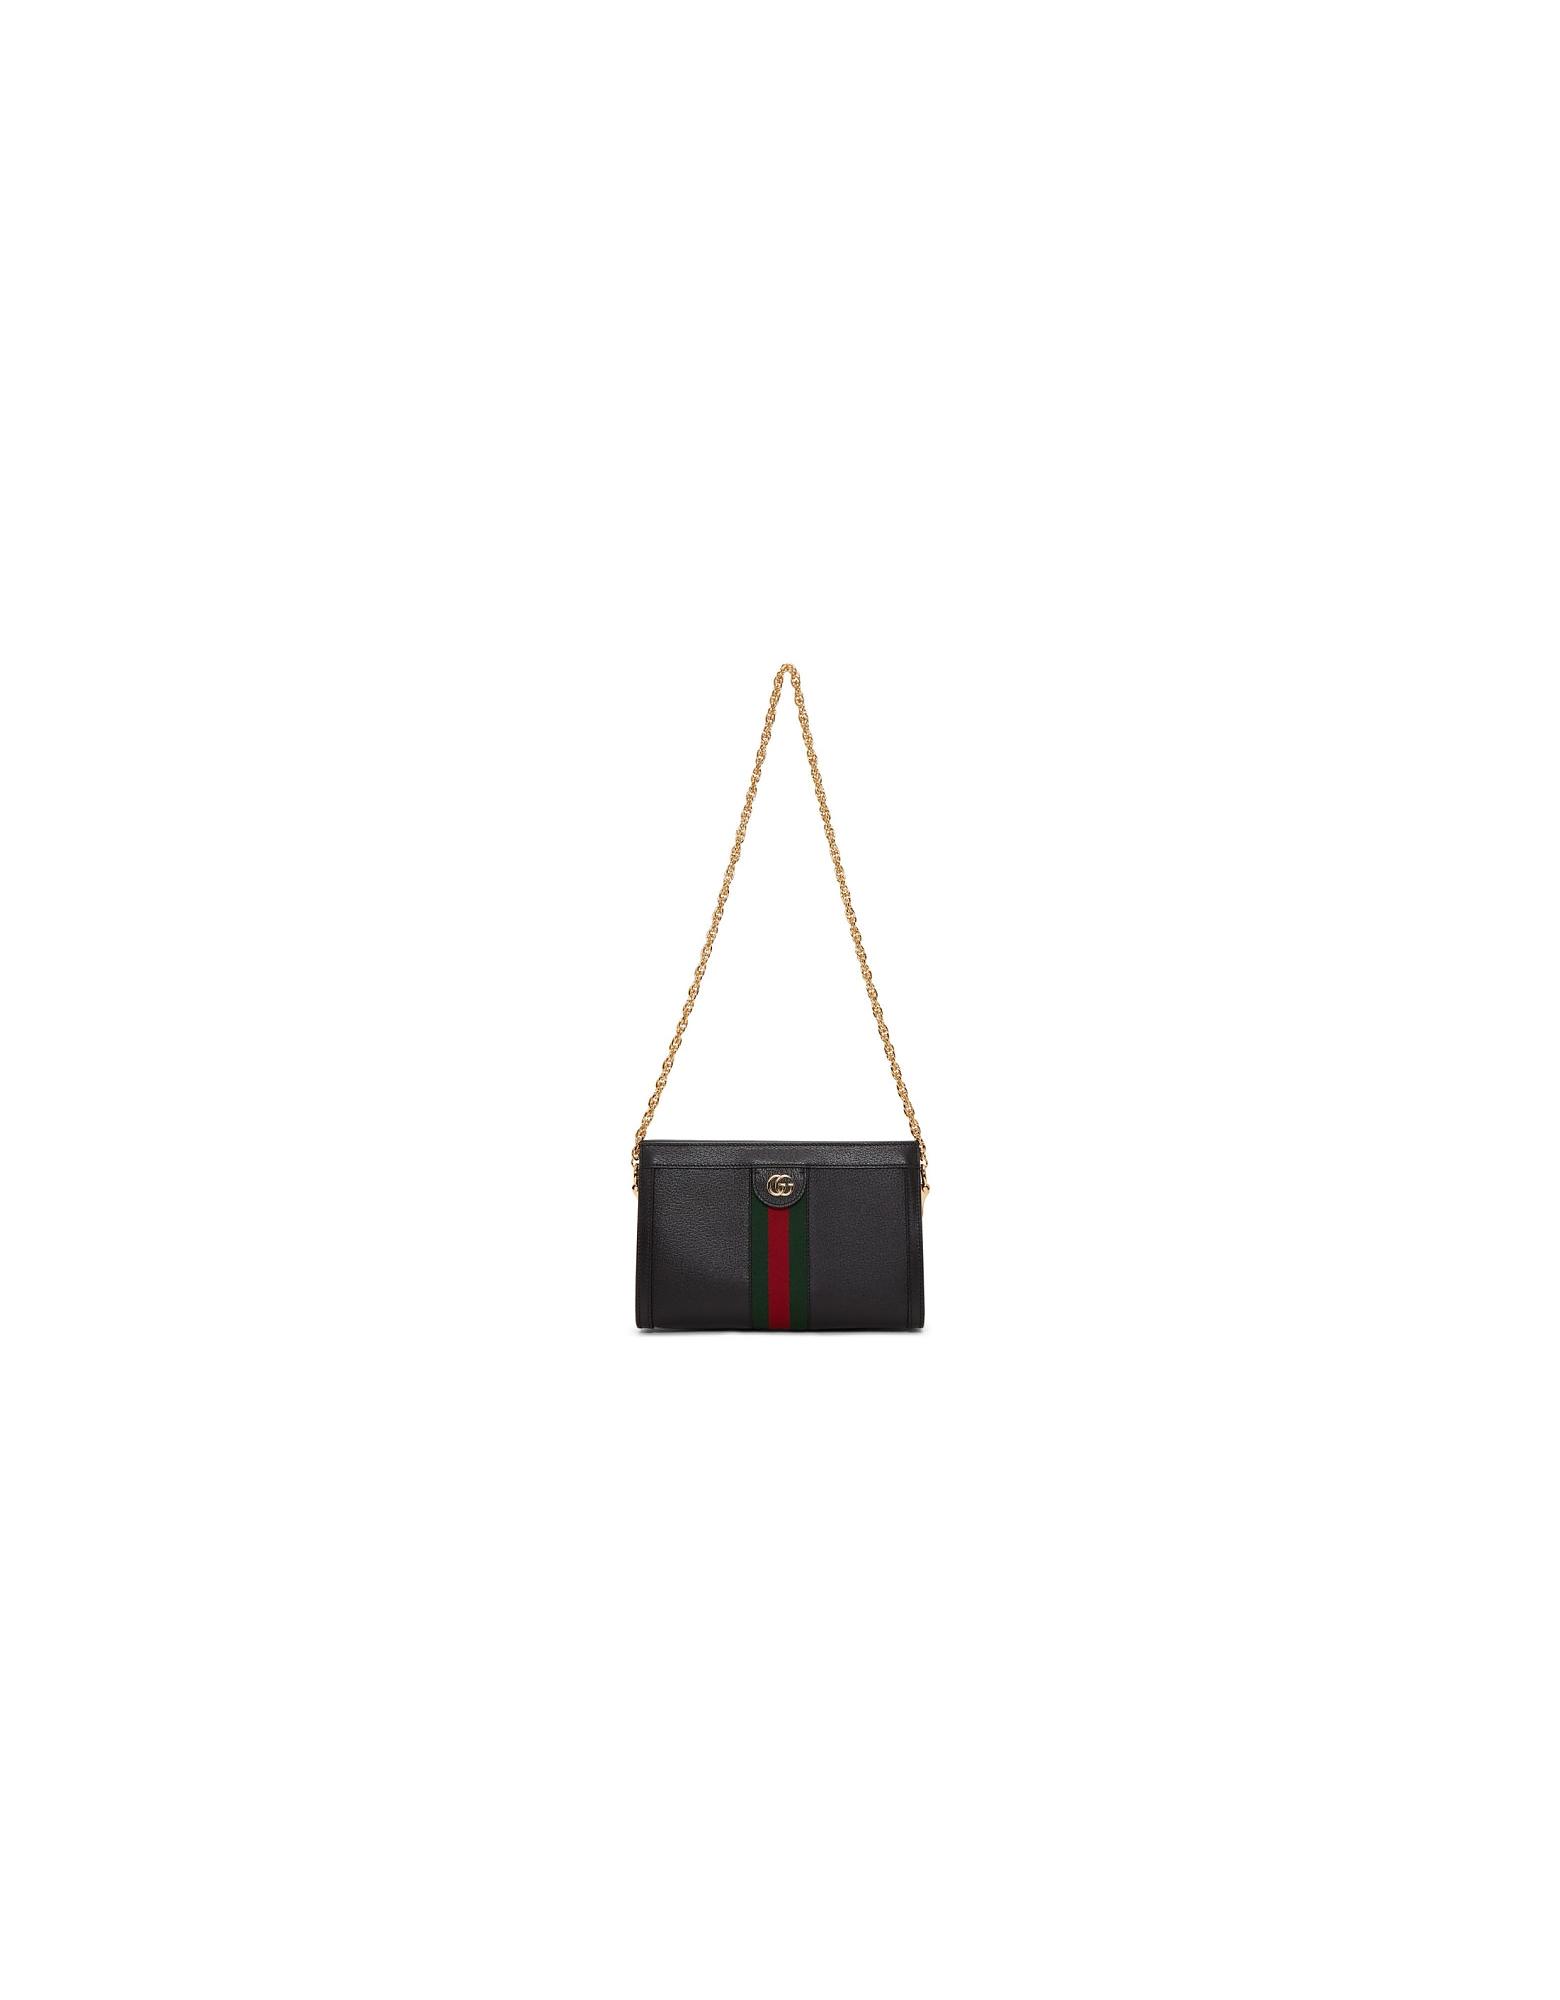 Gucci Designer Handbags, Black Small Ophidia Shoulder Bag